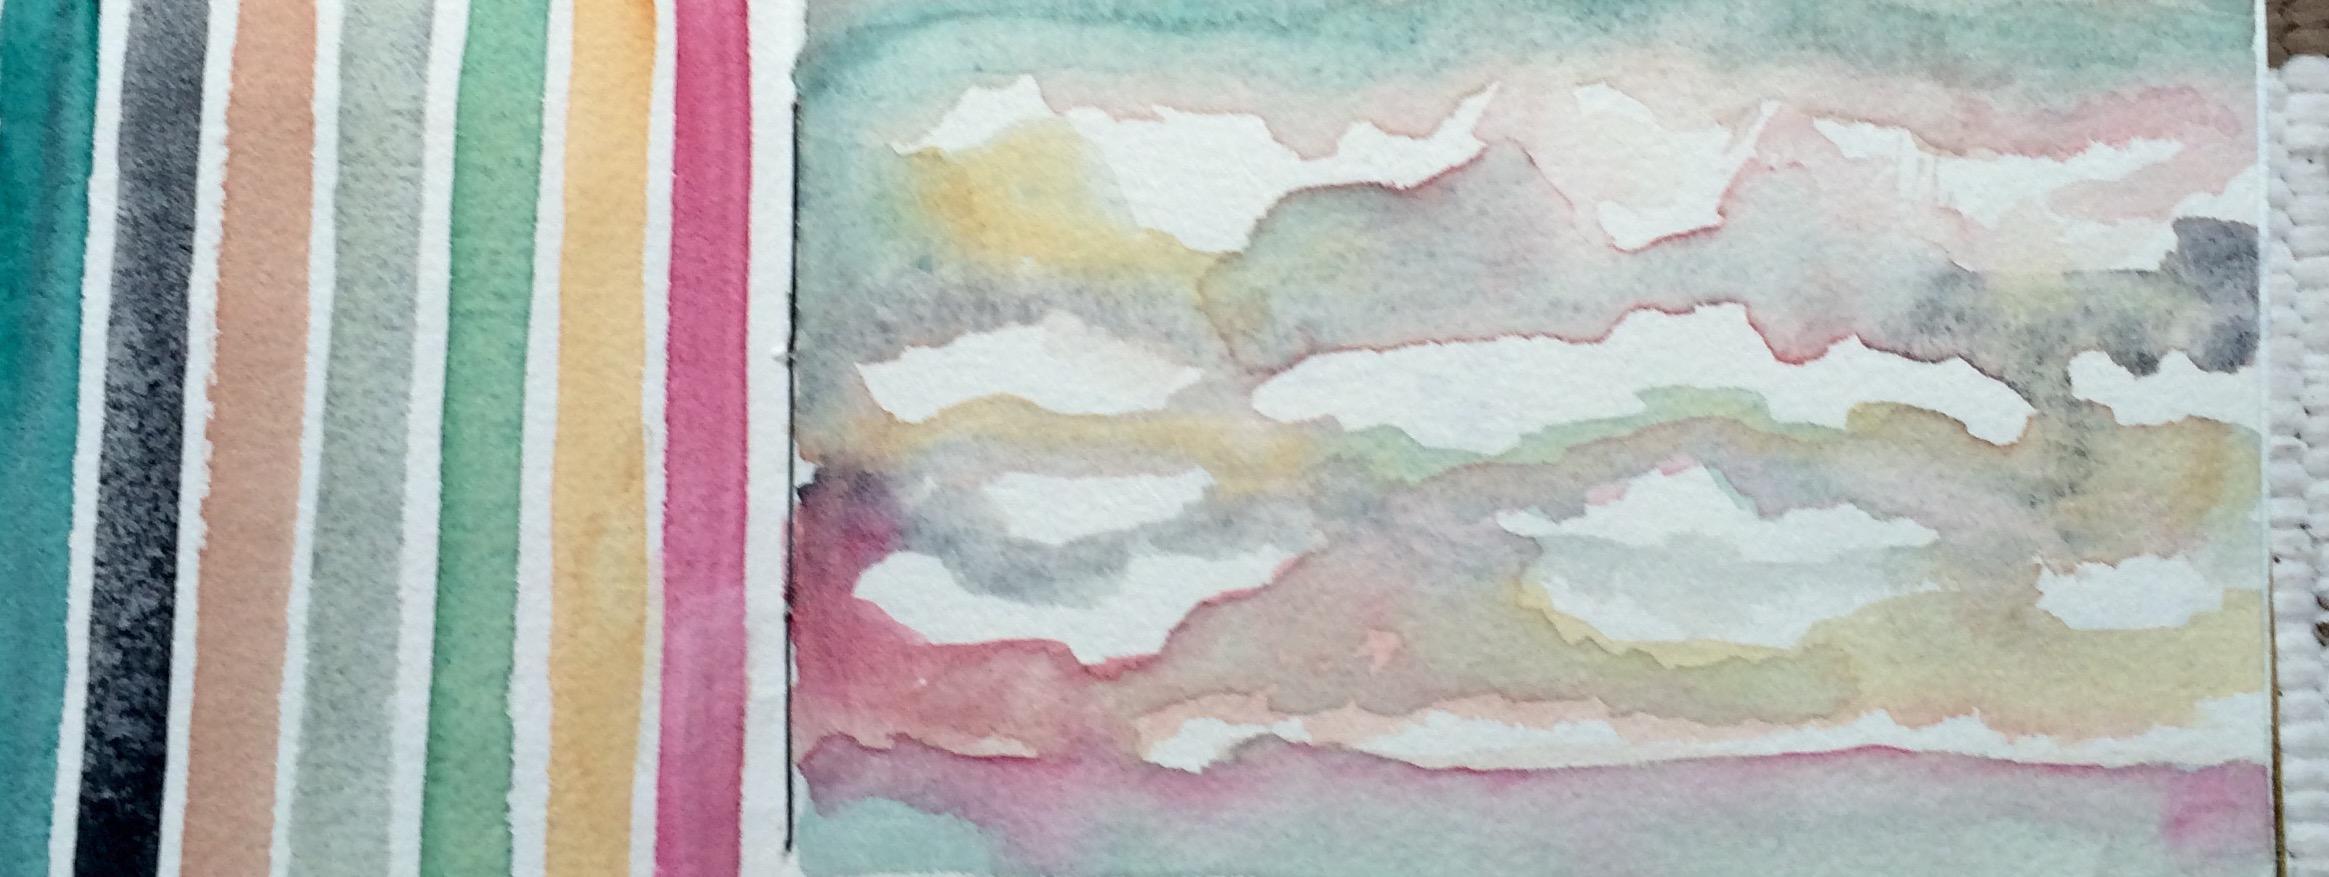 Making lines to create sky, L Doctor Sketchbook